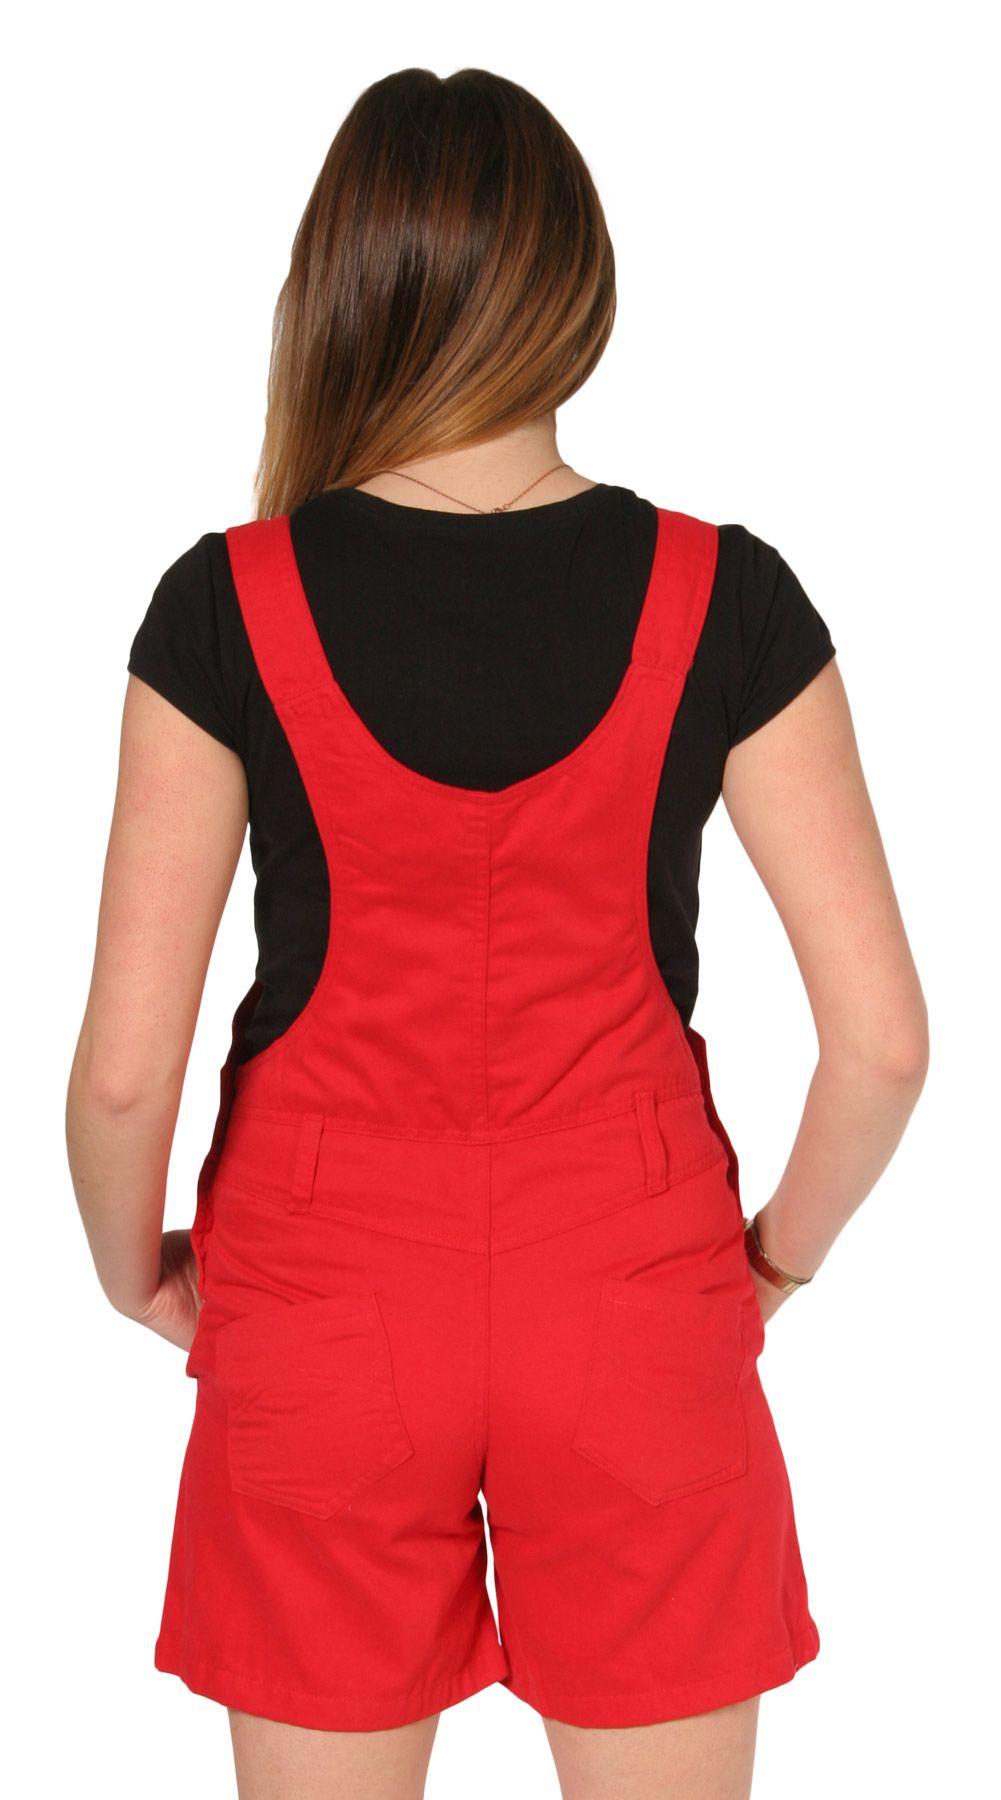 Sassy red dungaree shorts - fun festival wear! #dungarees #shortalls #red